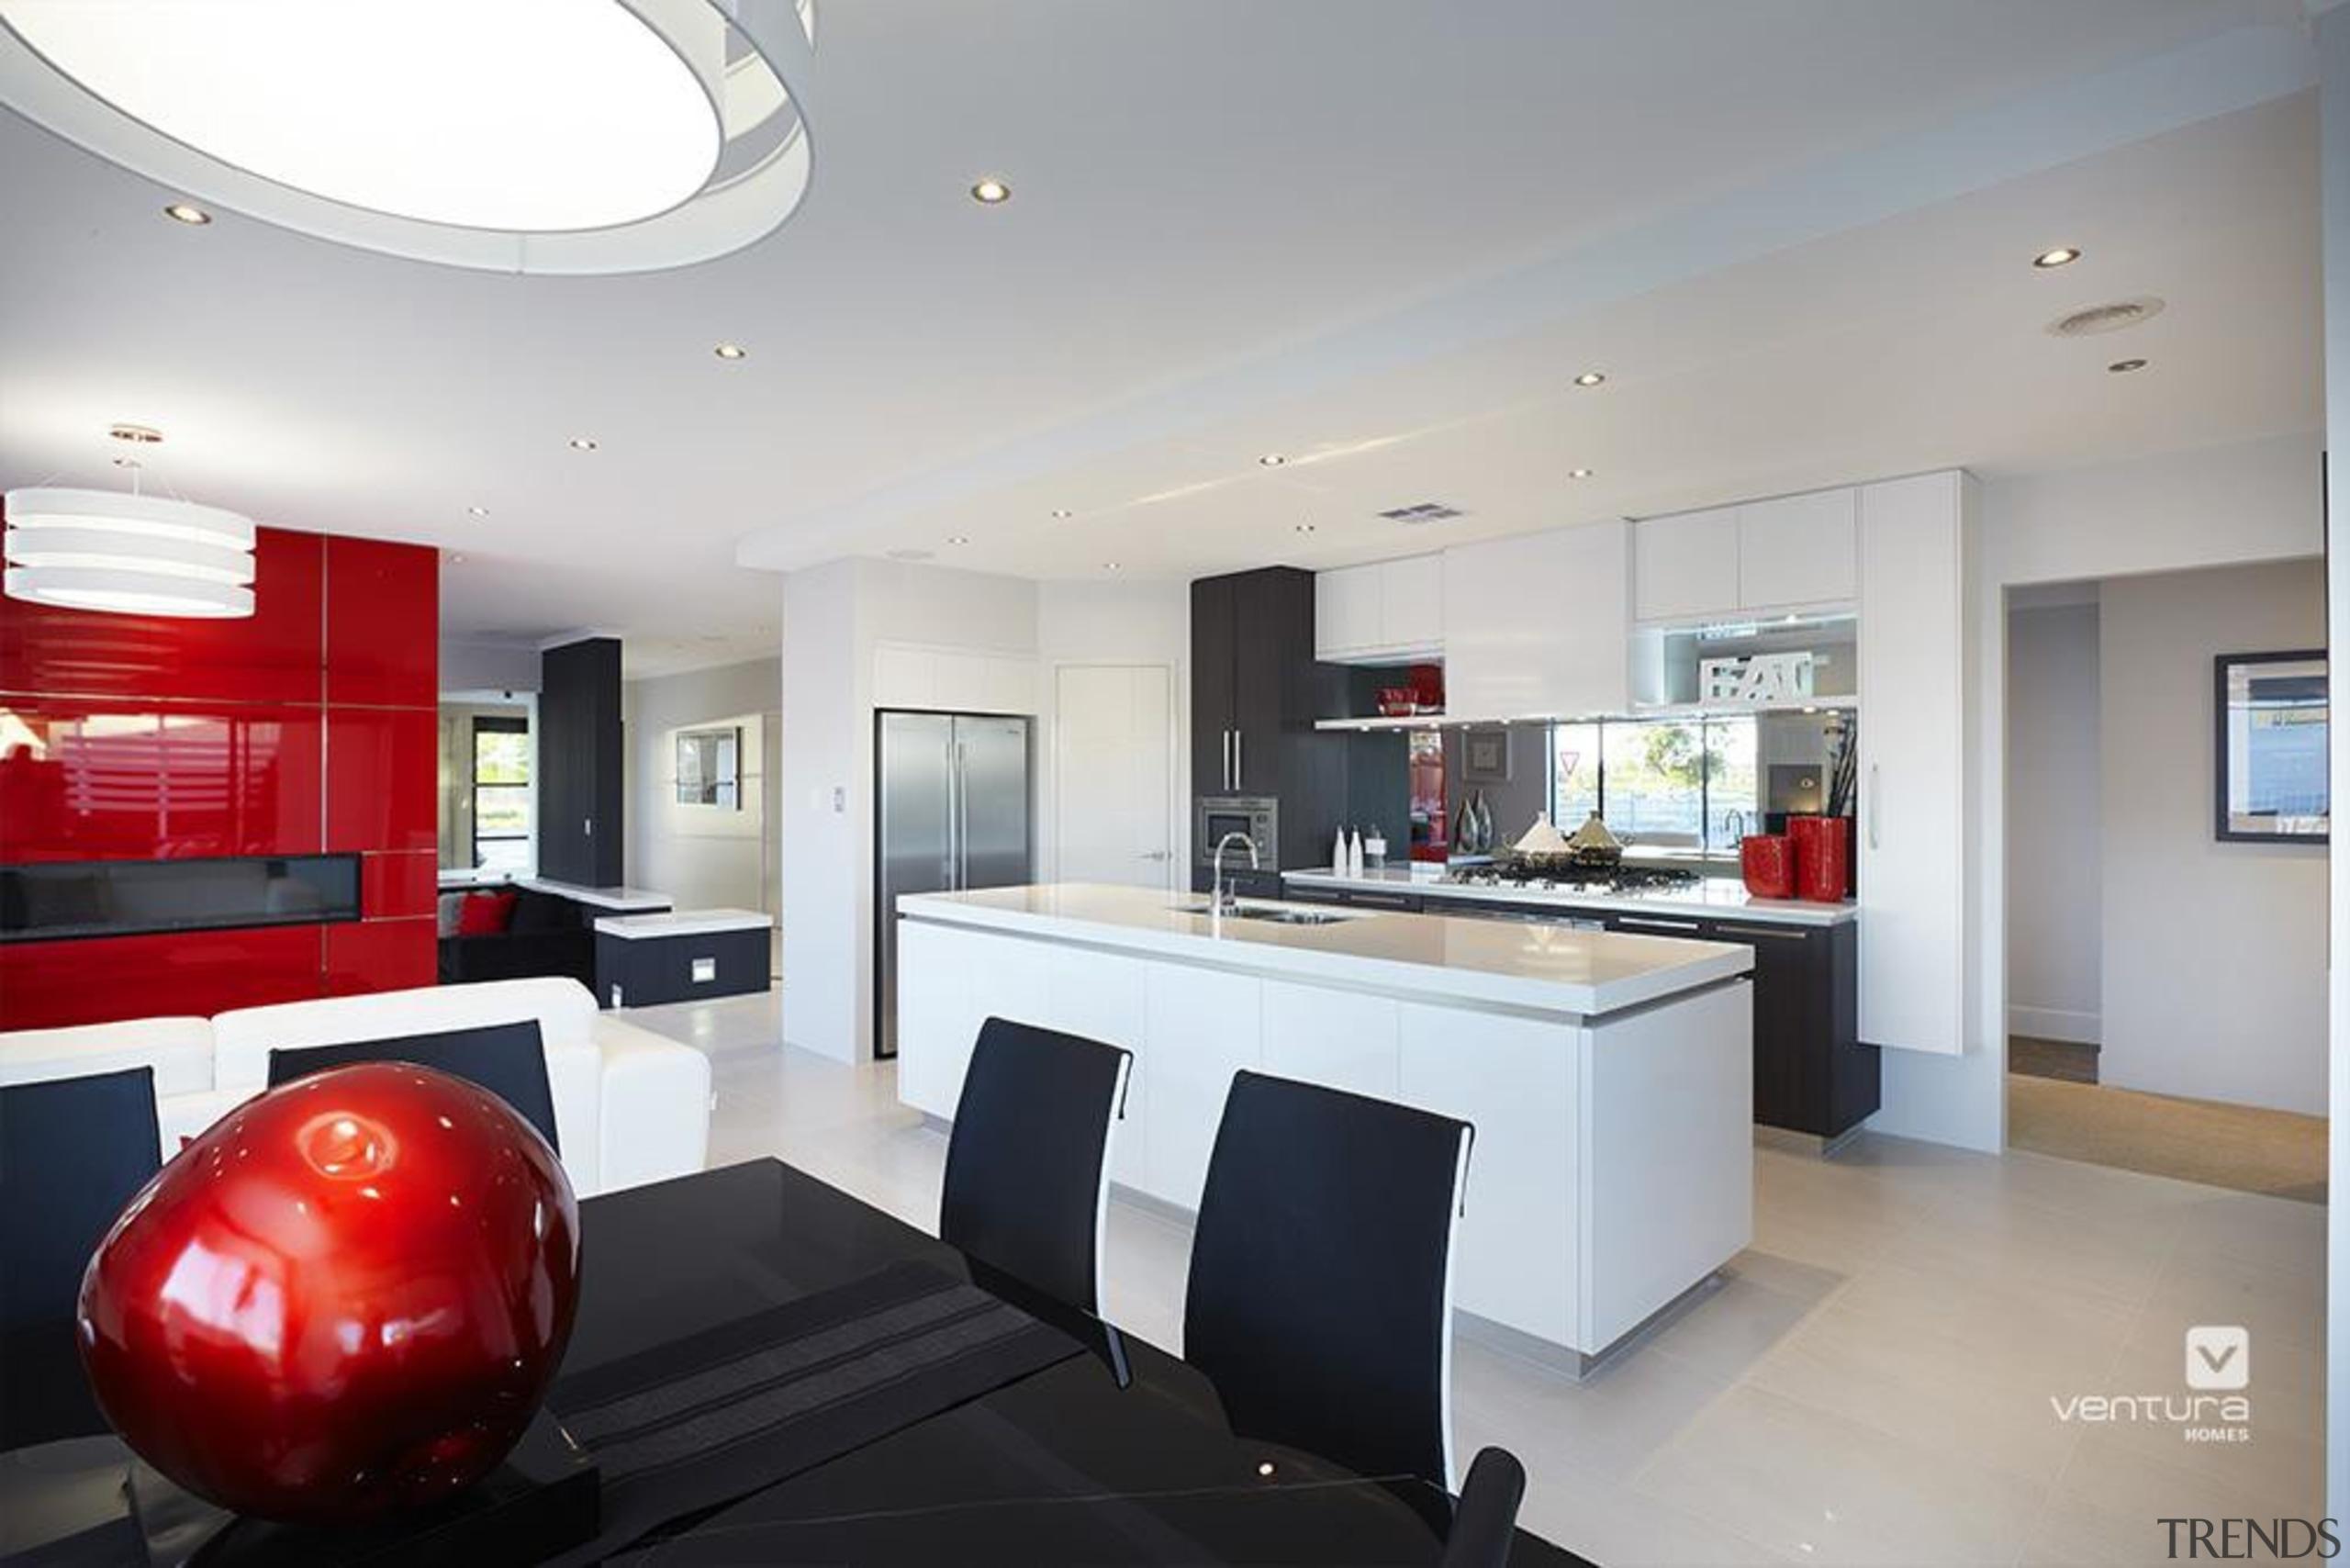 Kitchen design. - The Montrose Display Home - ceiling, interior design, kitchen, property, real estate, gray